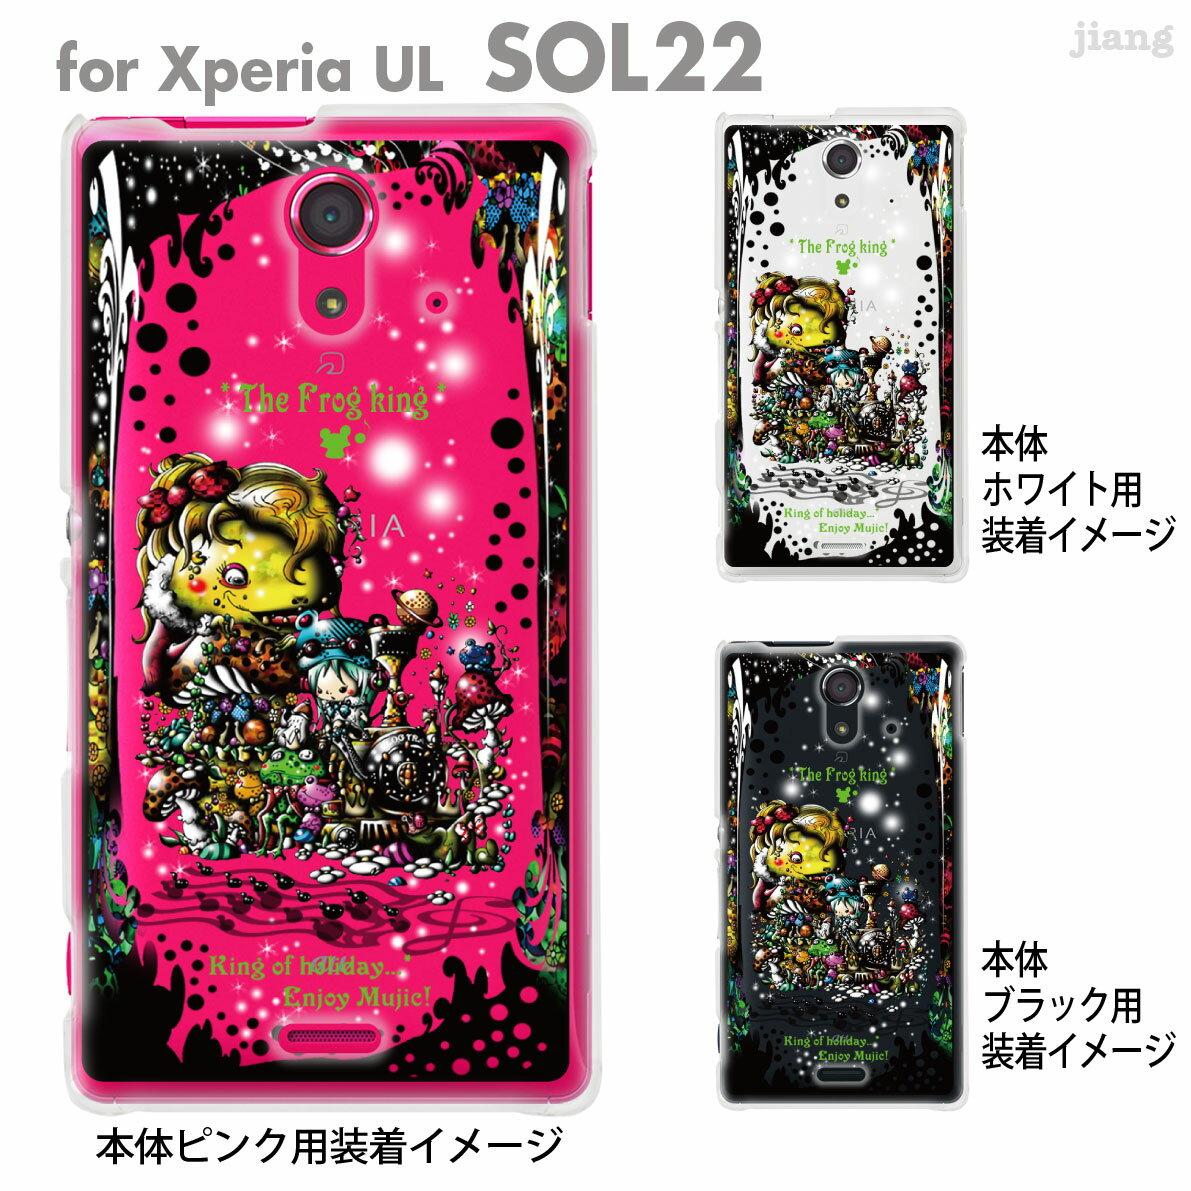 【Xperia UL SOL22】【SOL22】【au】【ケース】【カバー】【スマホケース】【スマートフォン】【クリアケース】【クリアーアーツ】【Clear Arts】【Little World】【グリム童話】【かえるの王様】 25-sol22-am0095